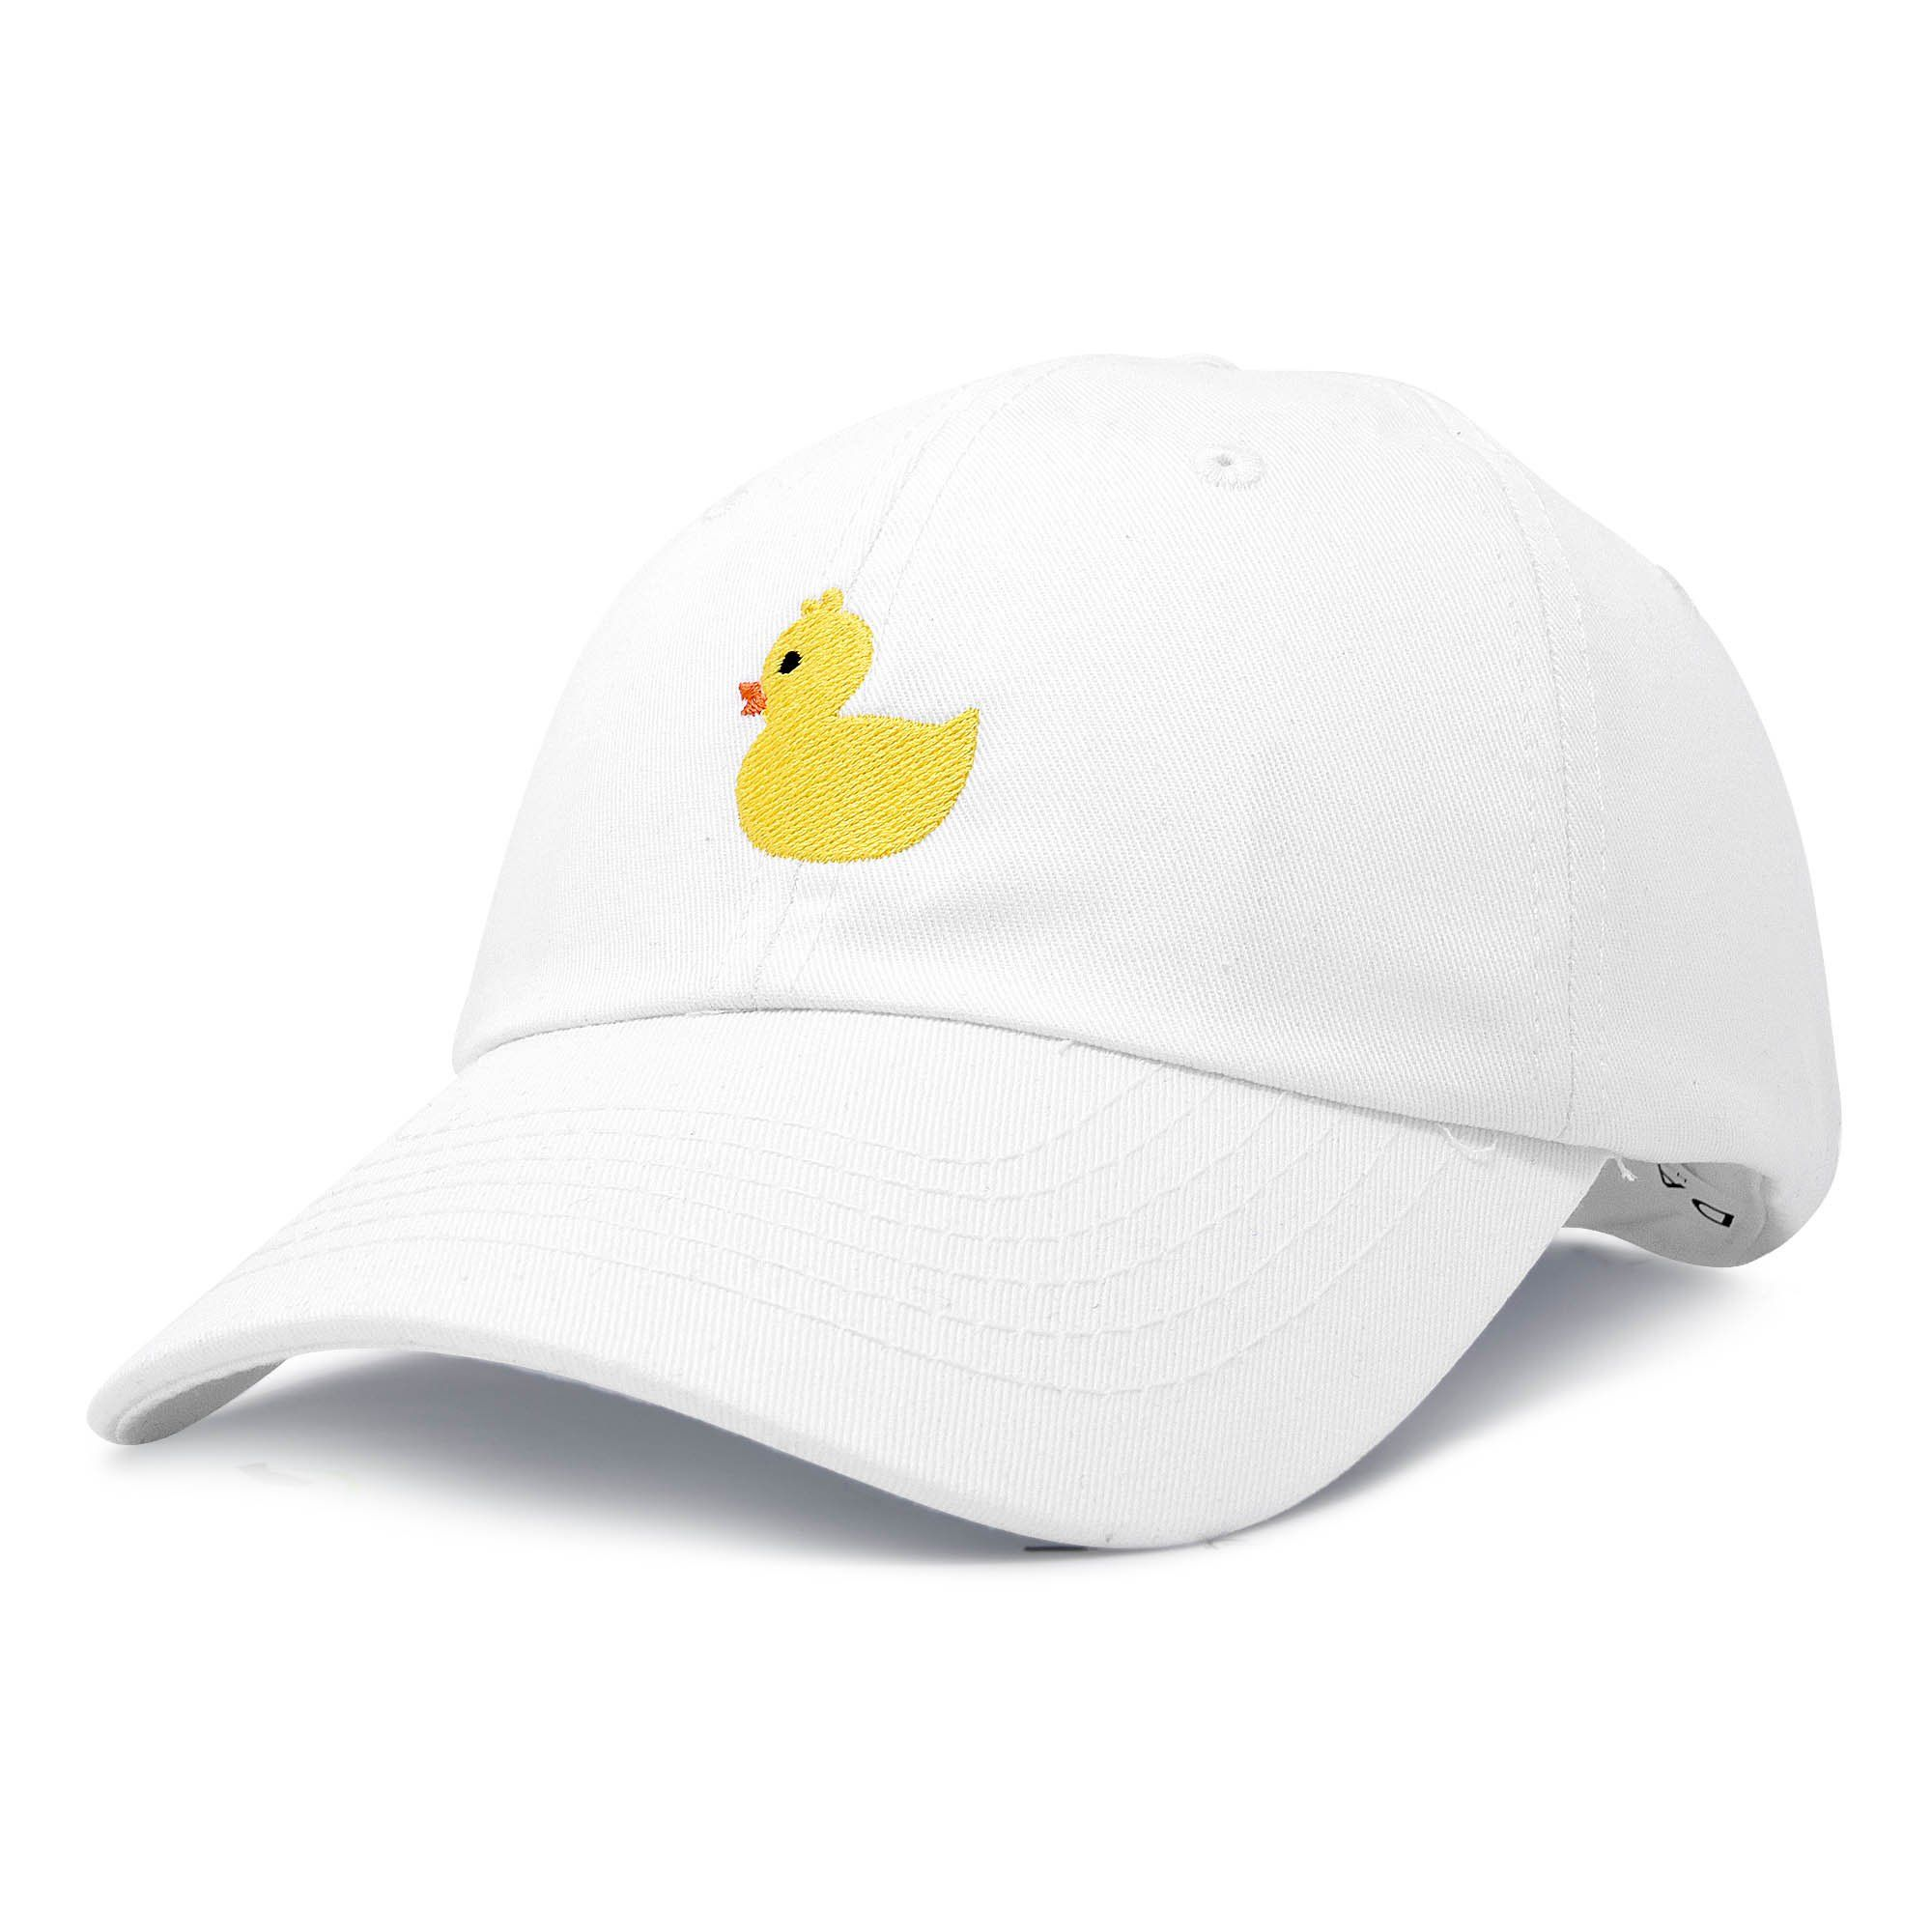 16edfb51d96e0 Cute Ducky Soft Baseball Cap Dad Hat in 2019   appearance   Hats ...